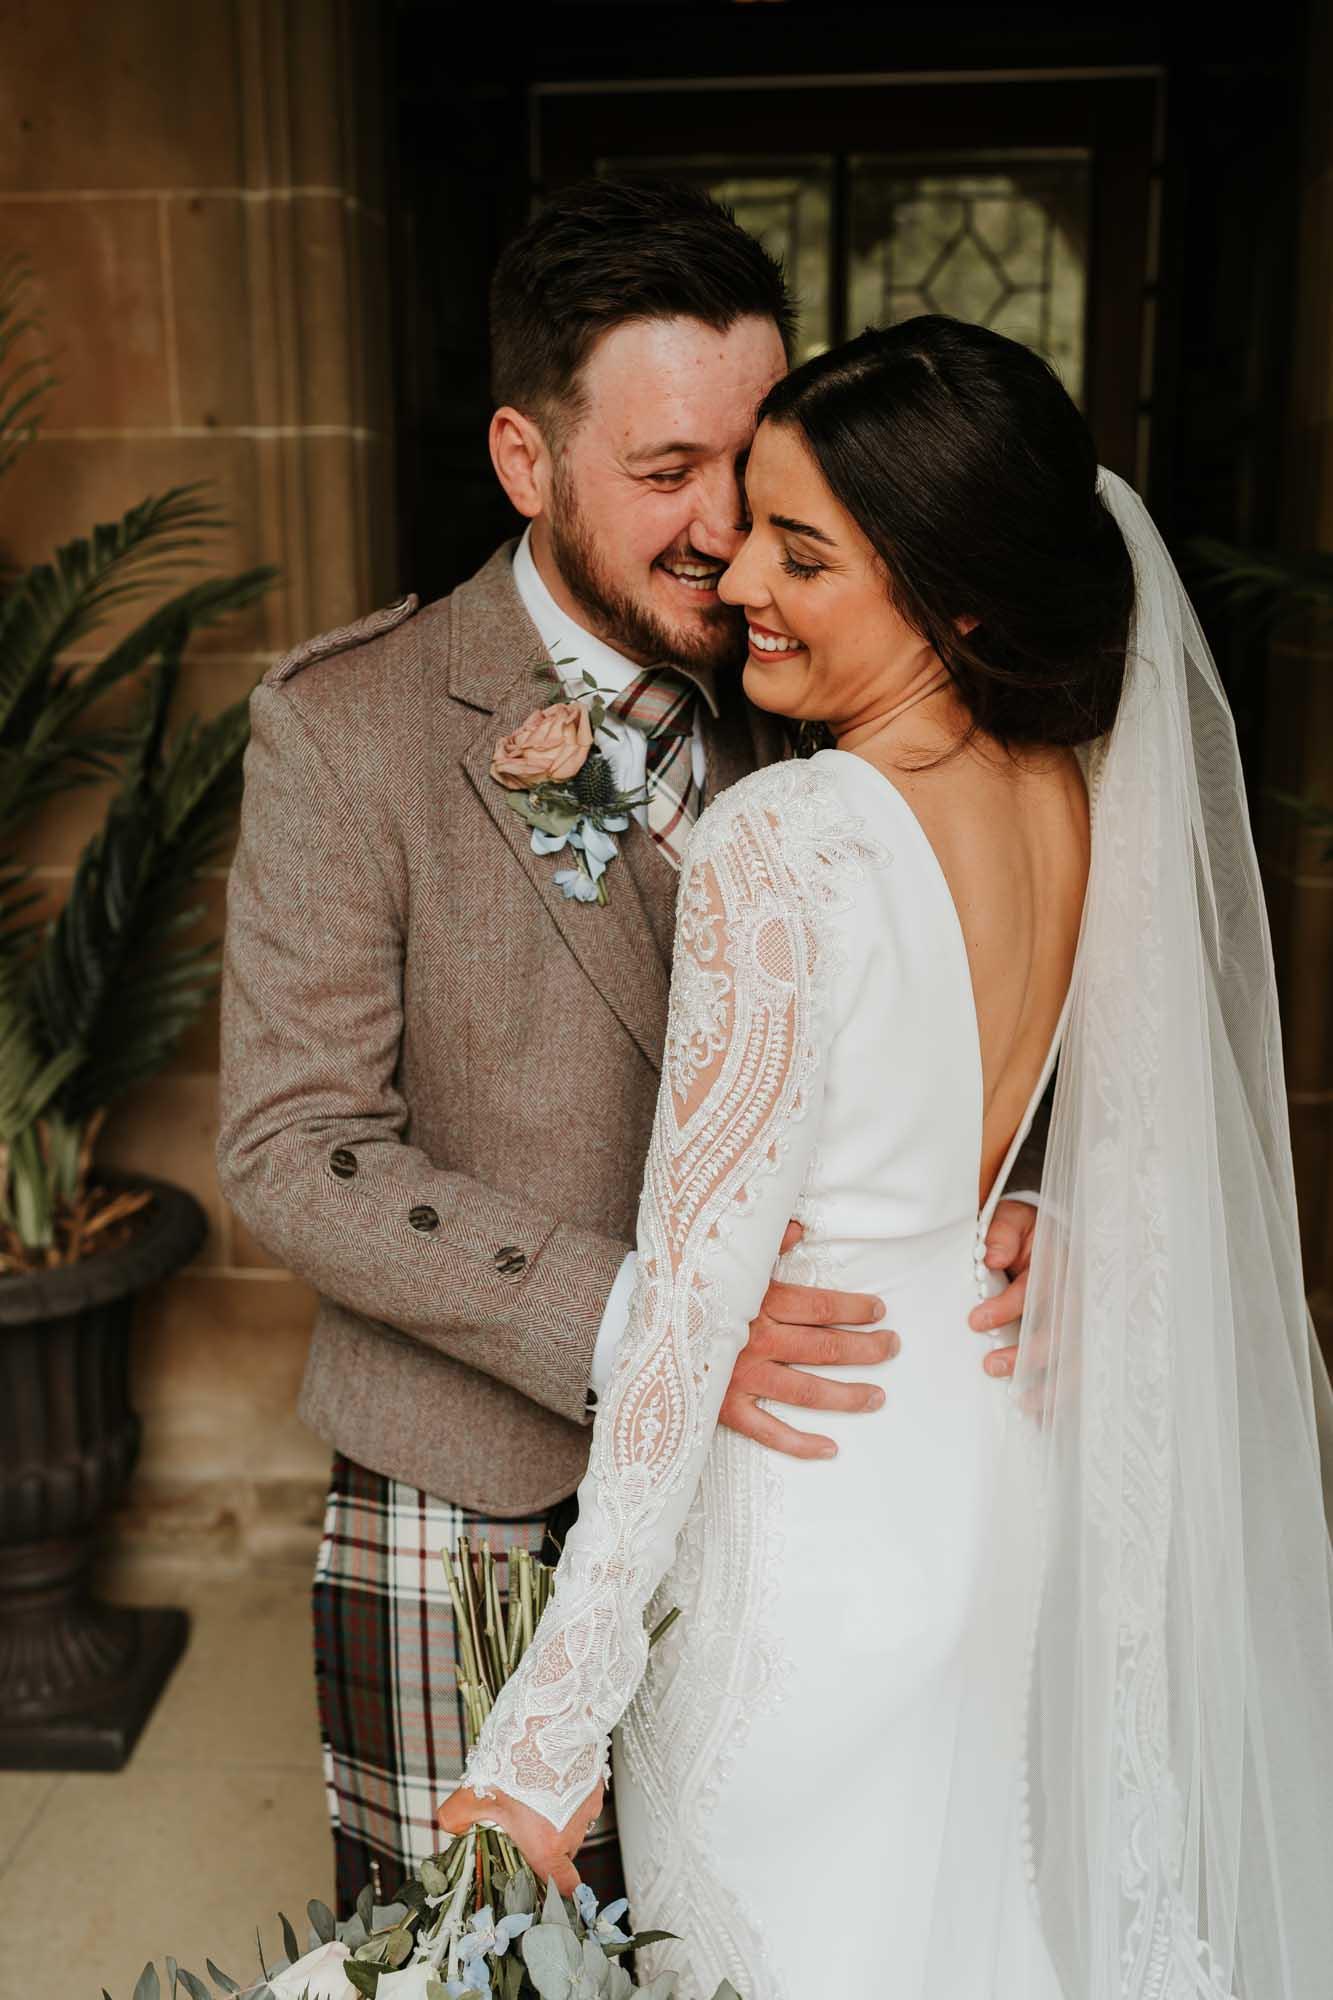 Cornhill Castle Wedding Blog -25